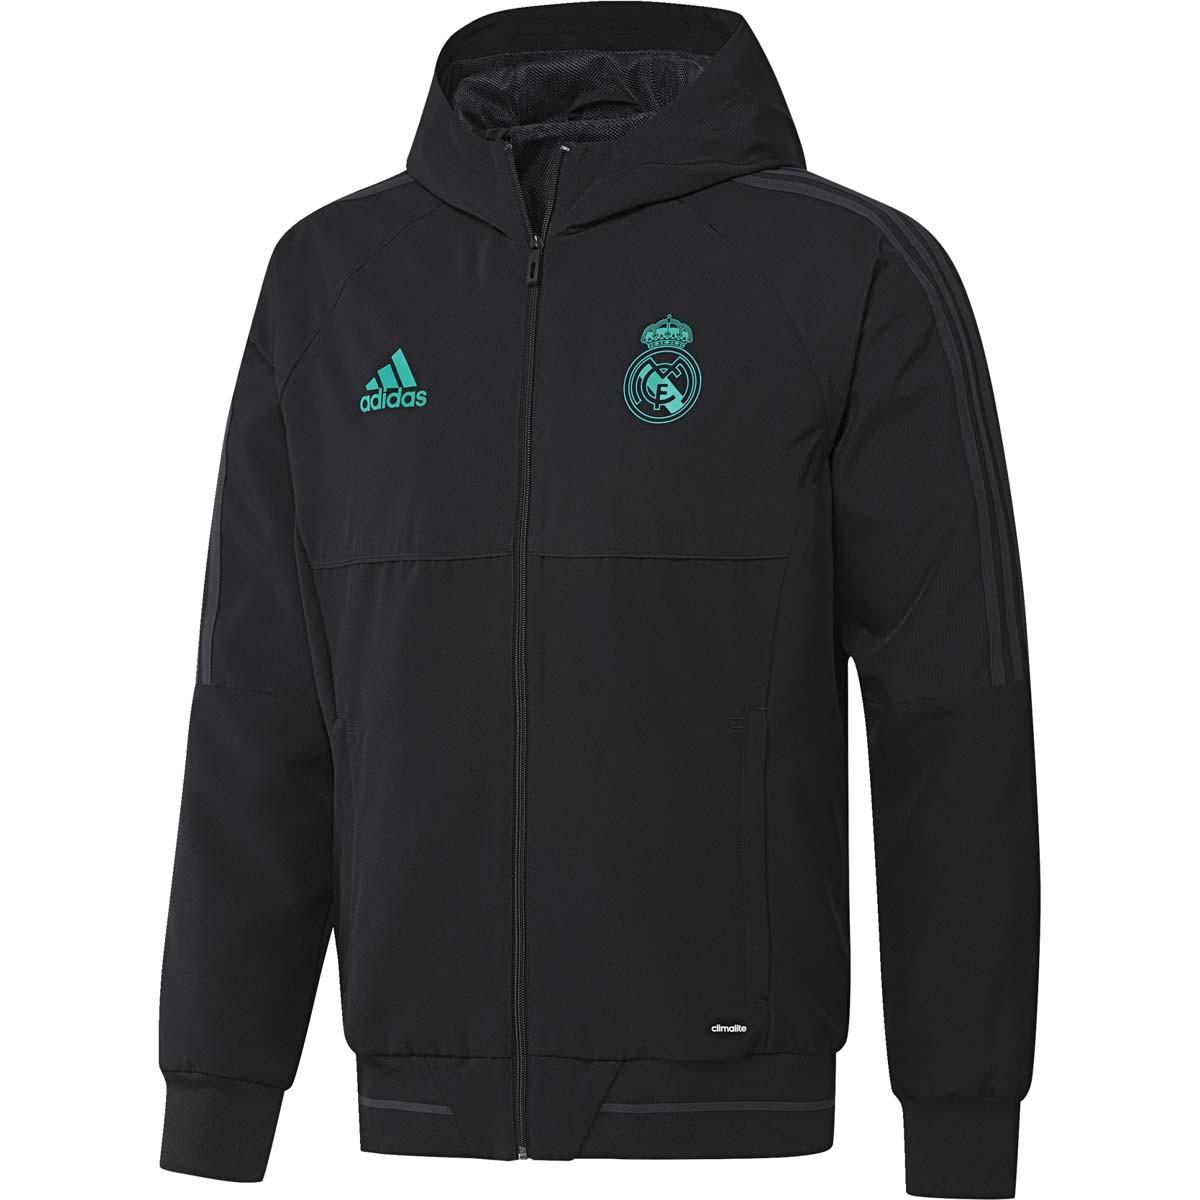 Adidas Noir Jkt Pre Madrid Real 20172018 Rayon QeCrxoBWdE